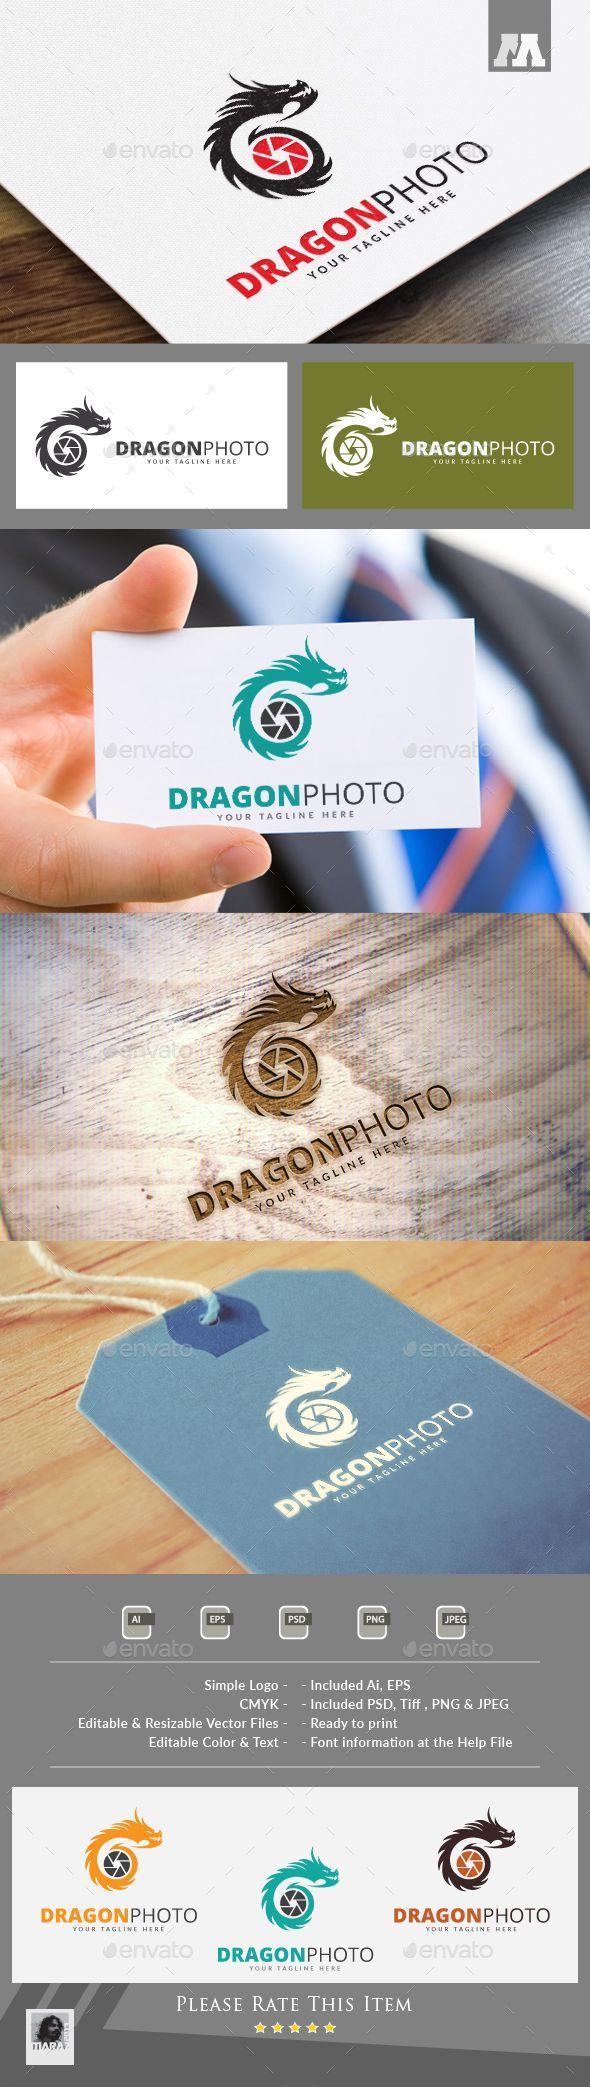 Dragon Photo Logo